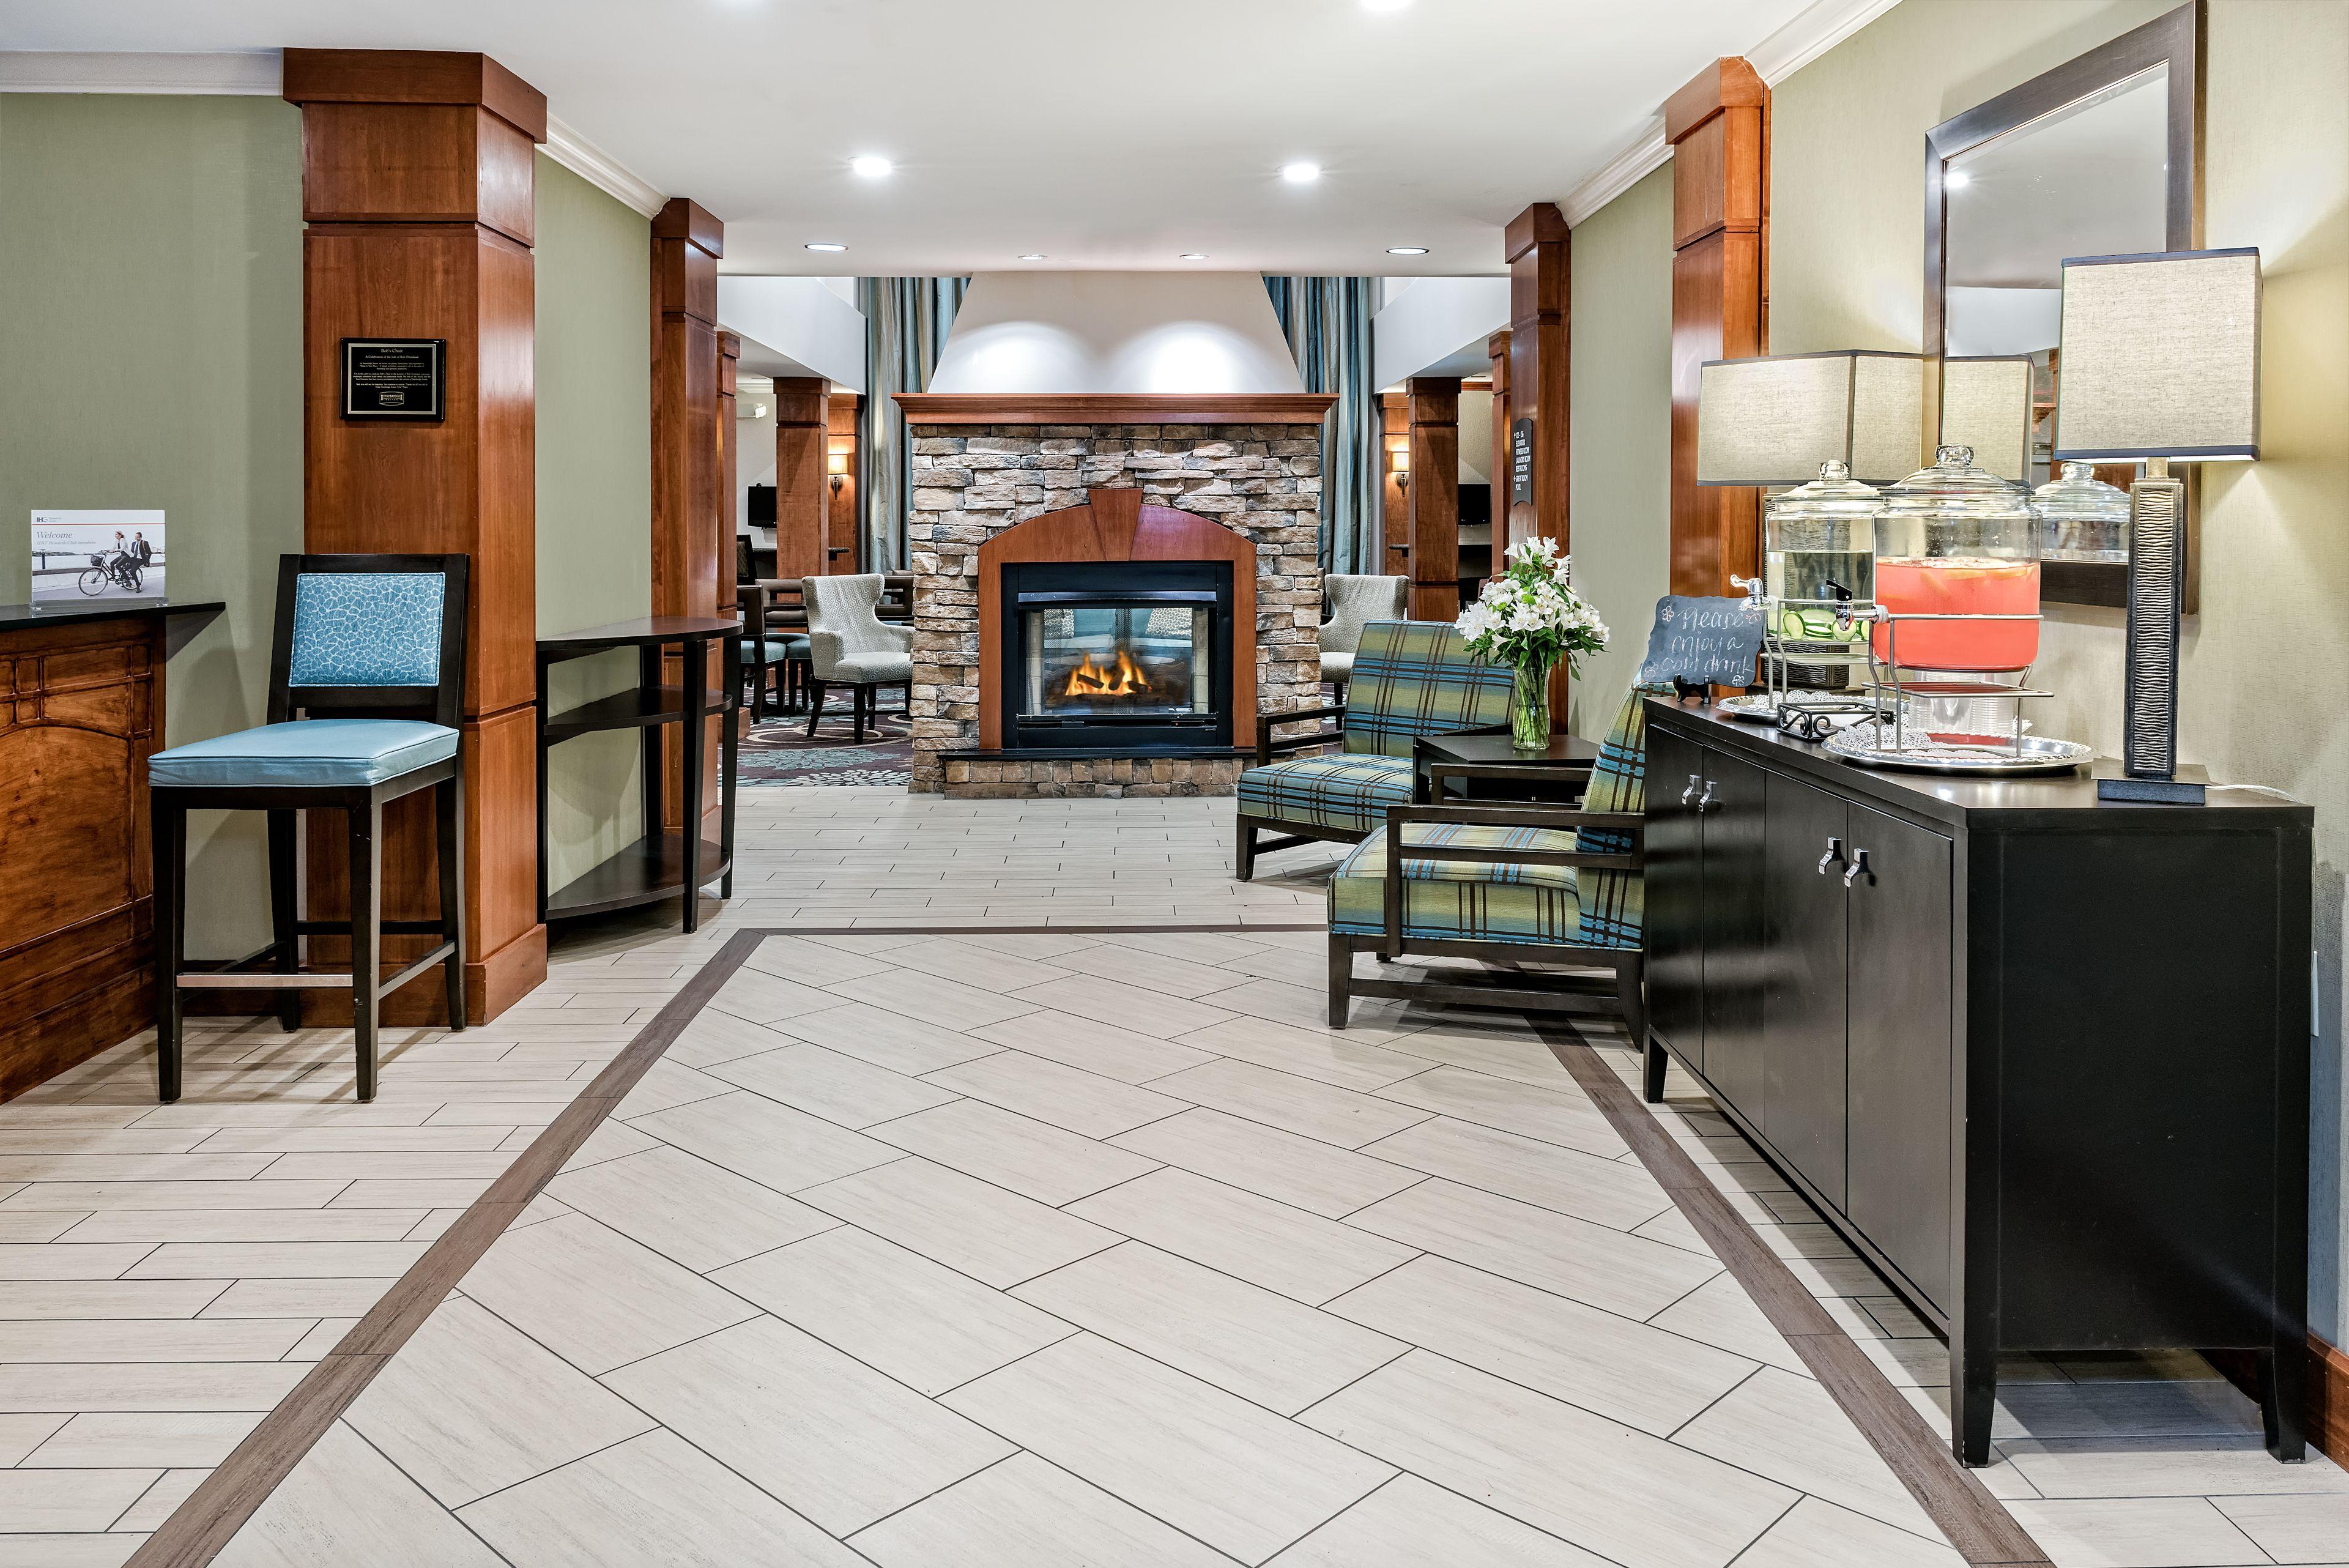 staybridge suites austin round rock in round rock tx. Black Bedroom Furniture Sets. Home Design Ideas